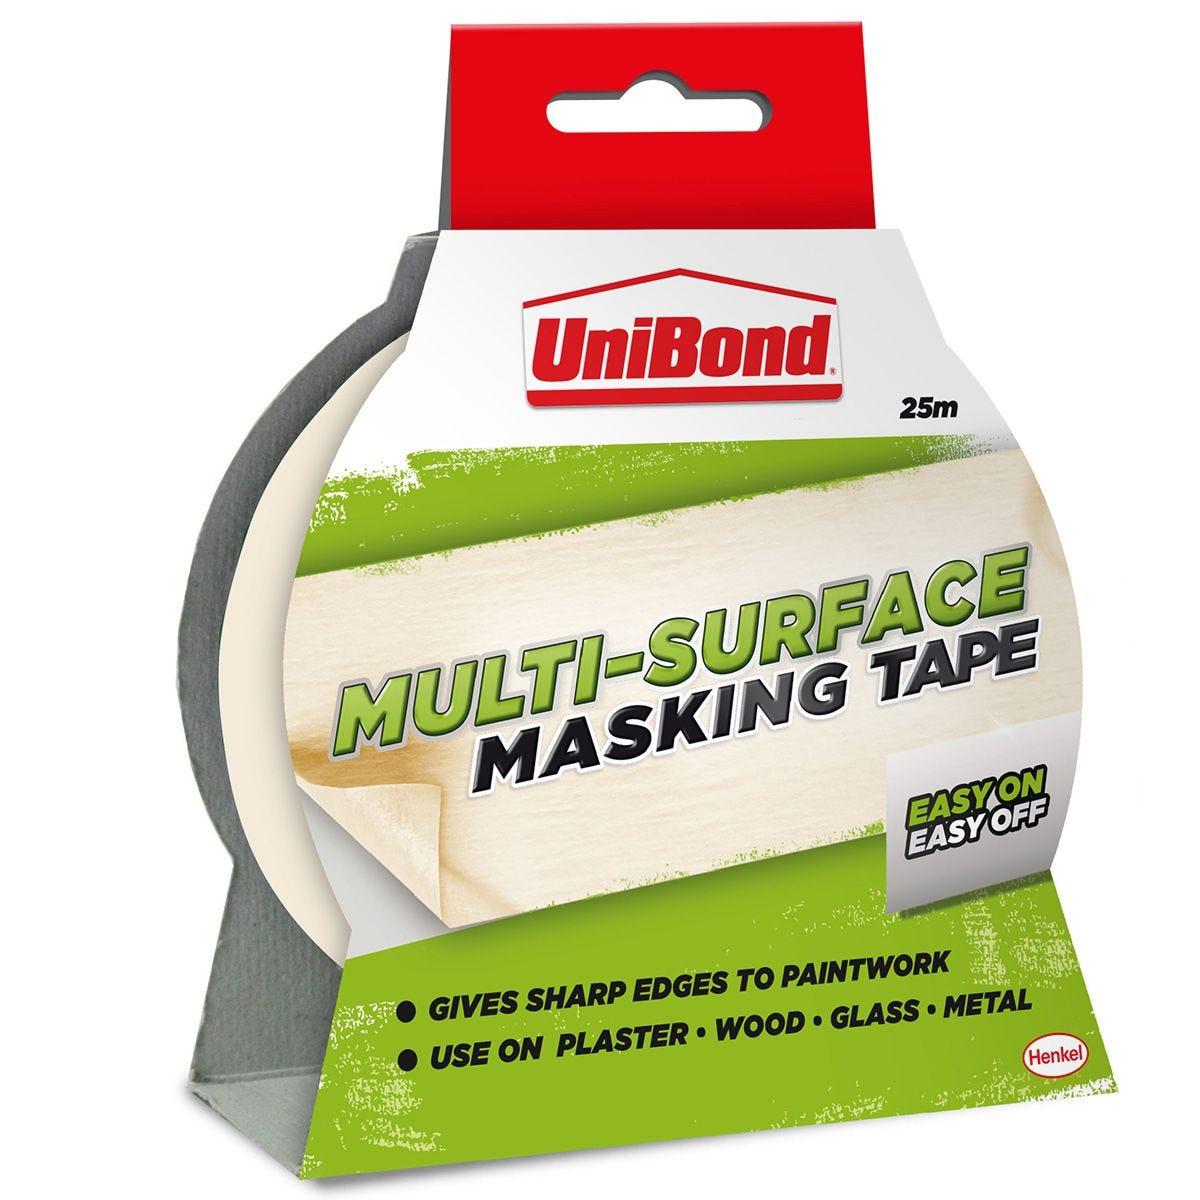 UniBond Easy On/Off Masking Tape 25mm x 25m - Cream